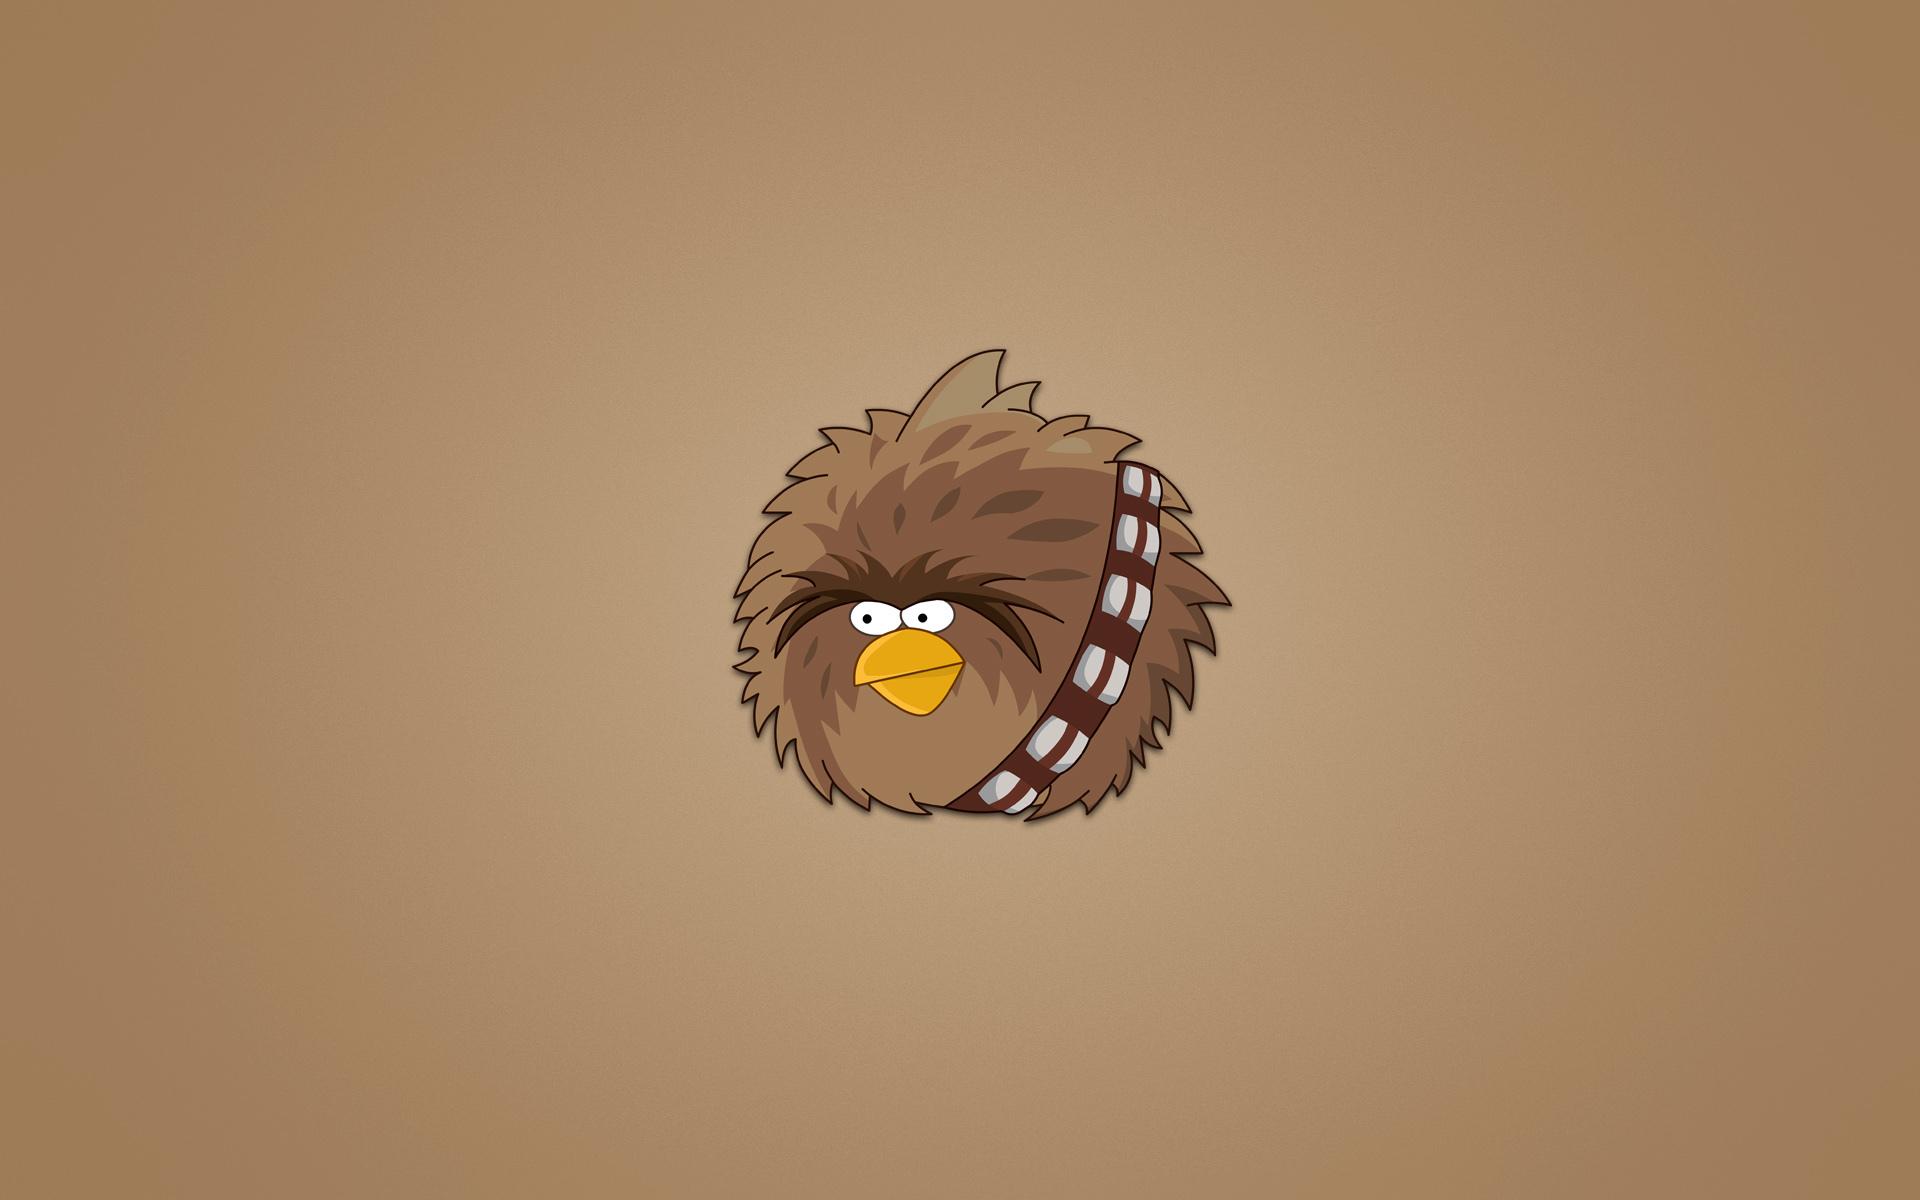 Wallpaper star wars star wars bird hairy chewbacca chewbacca 1920x1200